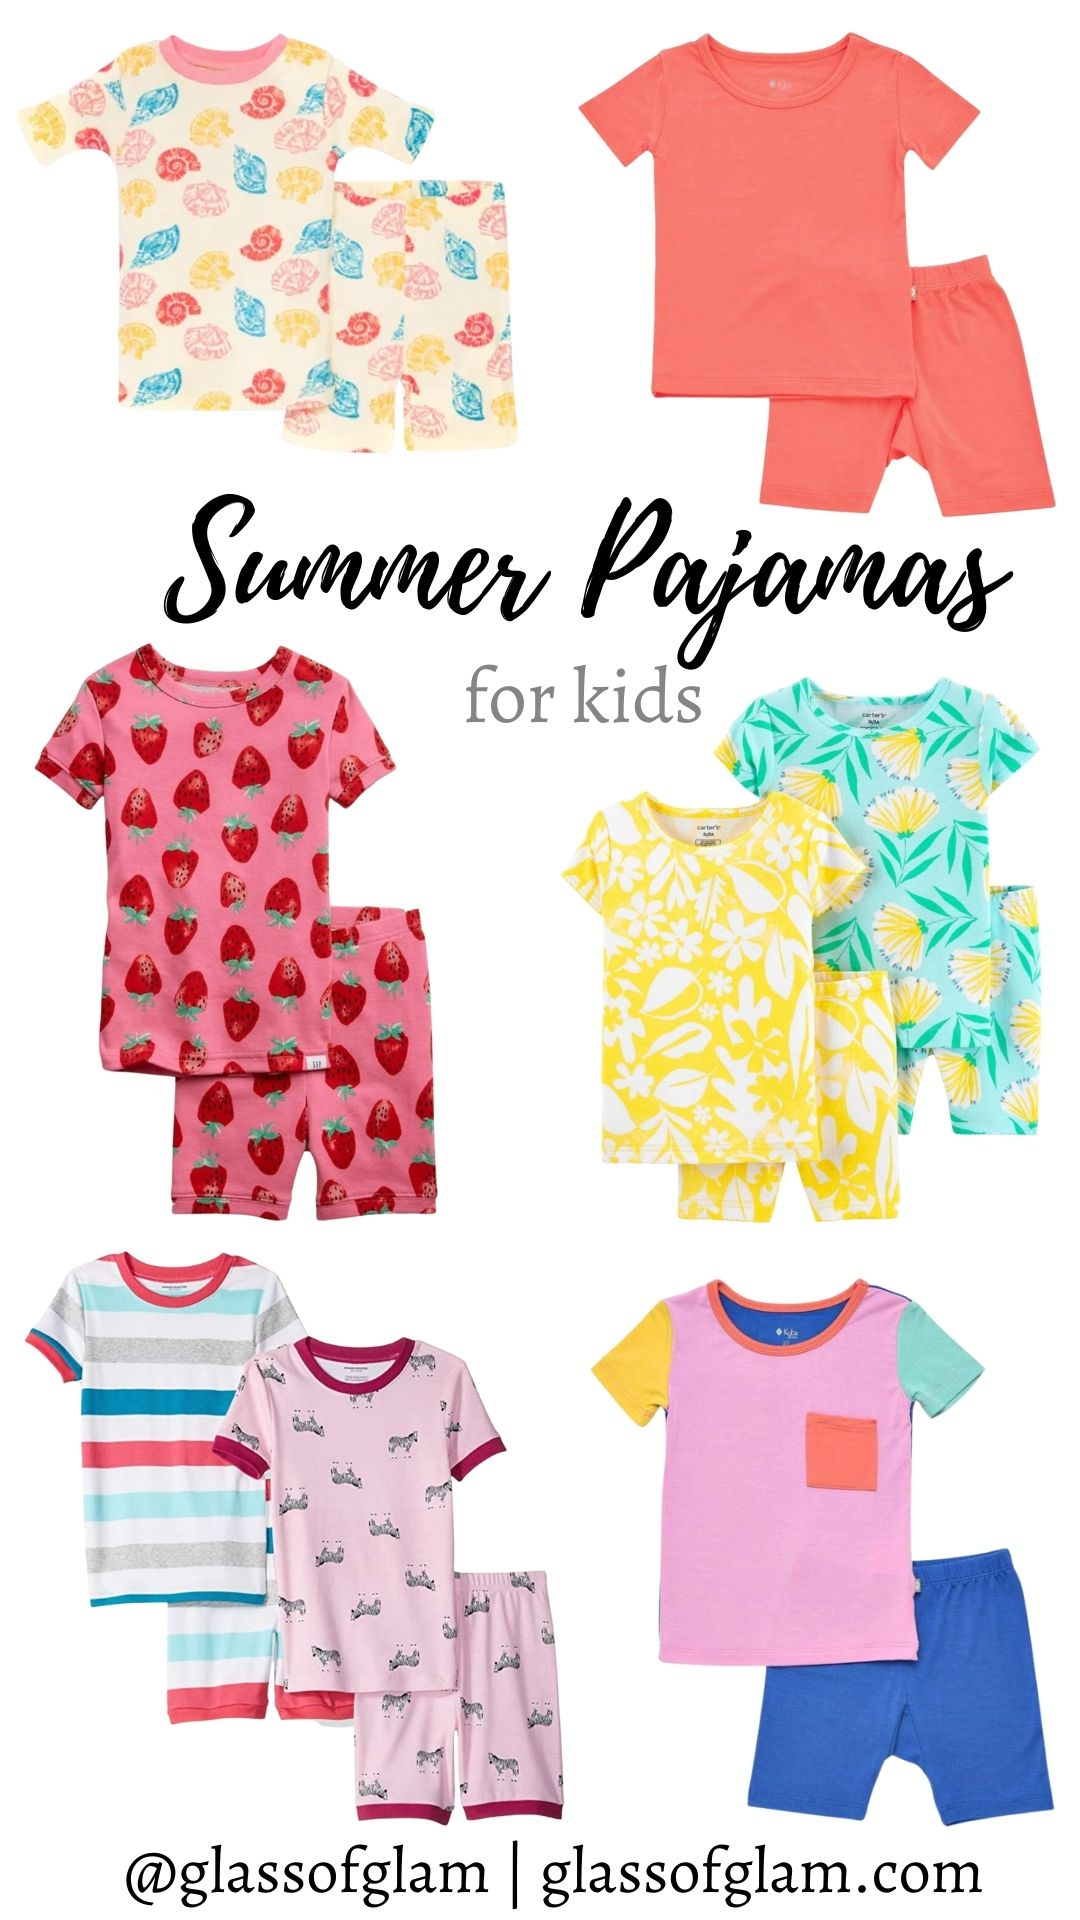 Kids Summer Pajamas by popular Chicago fashion blog, Glass of Glam: collage image of girls summer pajama sets.